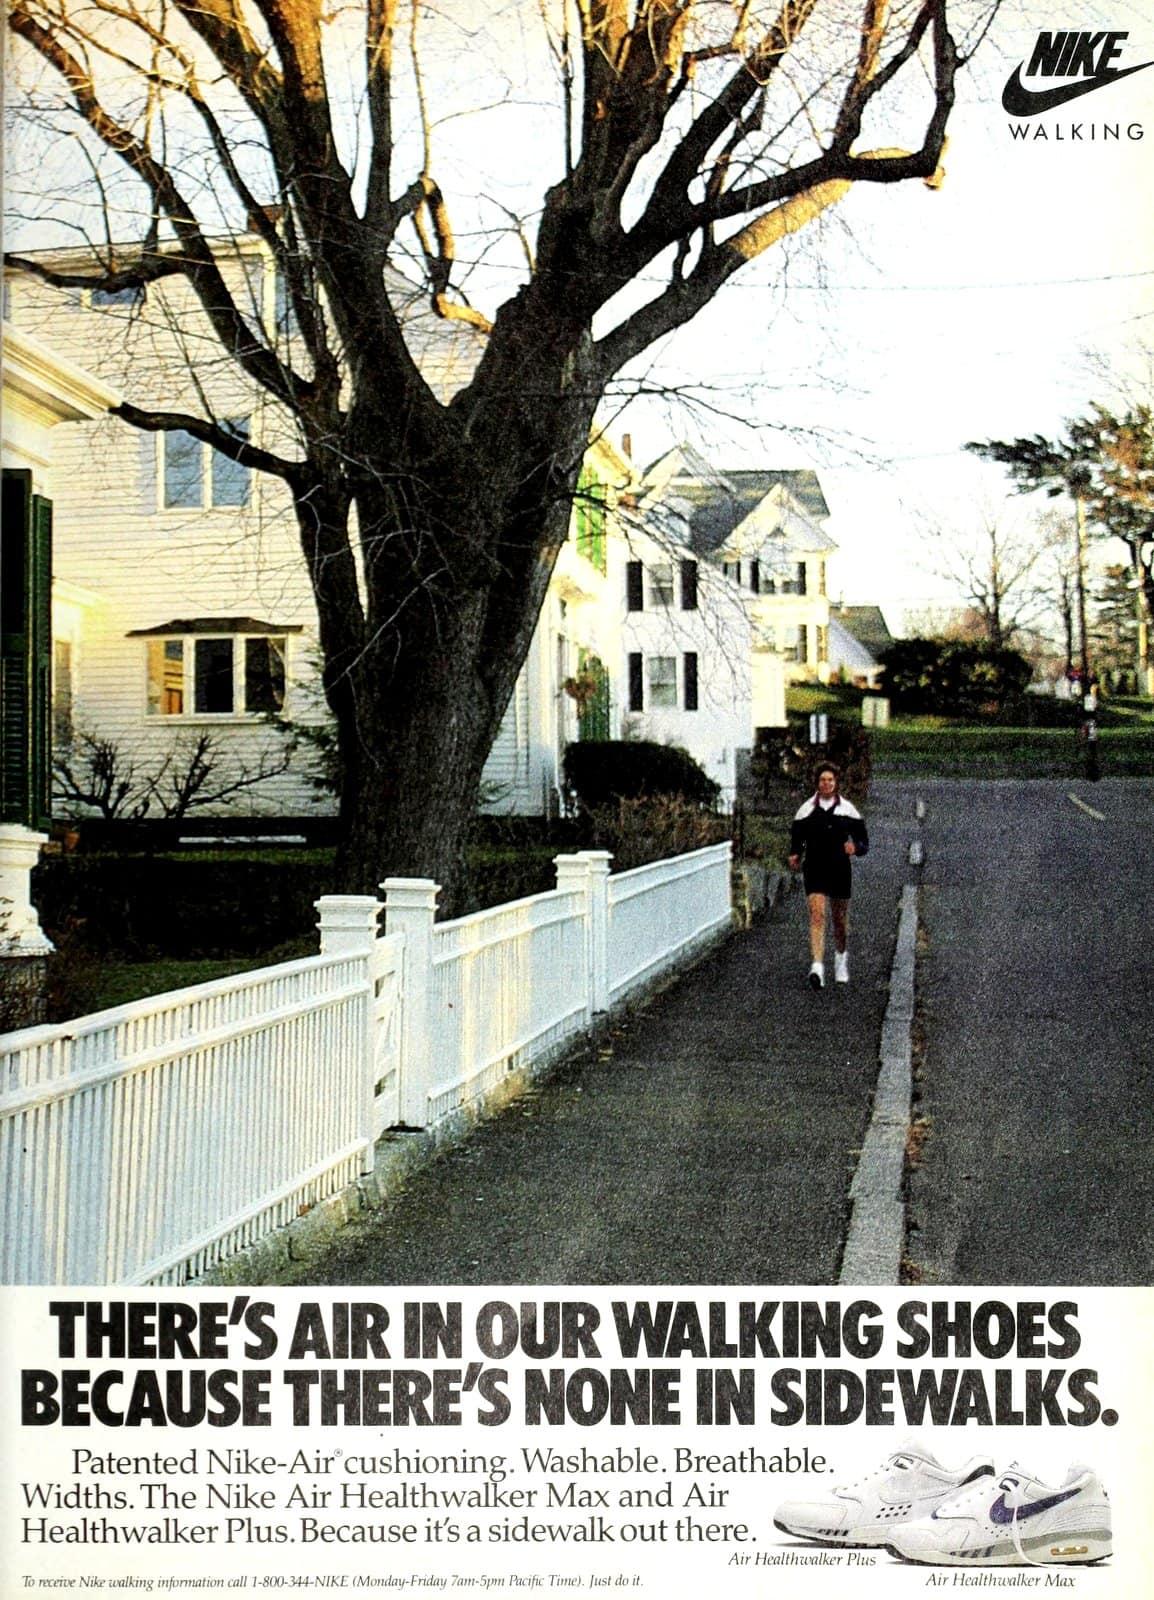 Retro Nike walking shoes (1989)